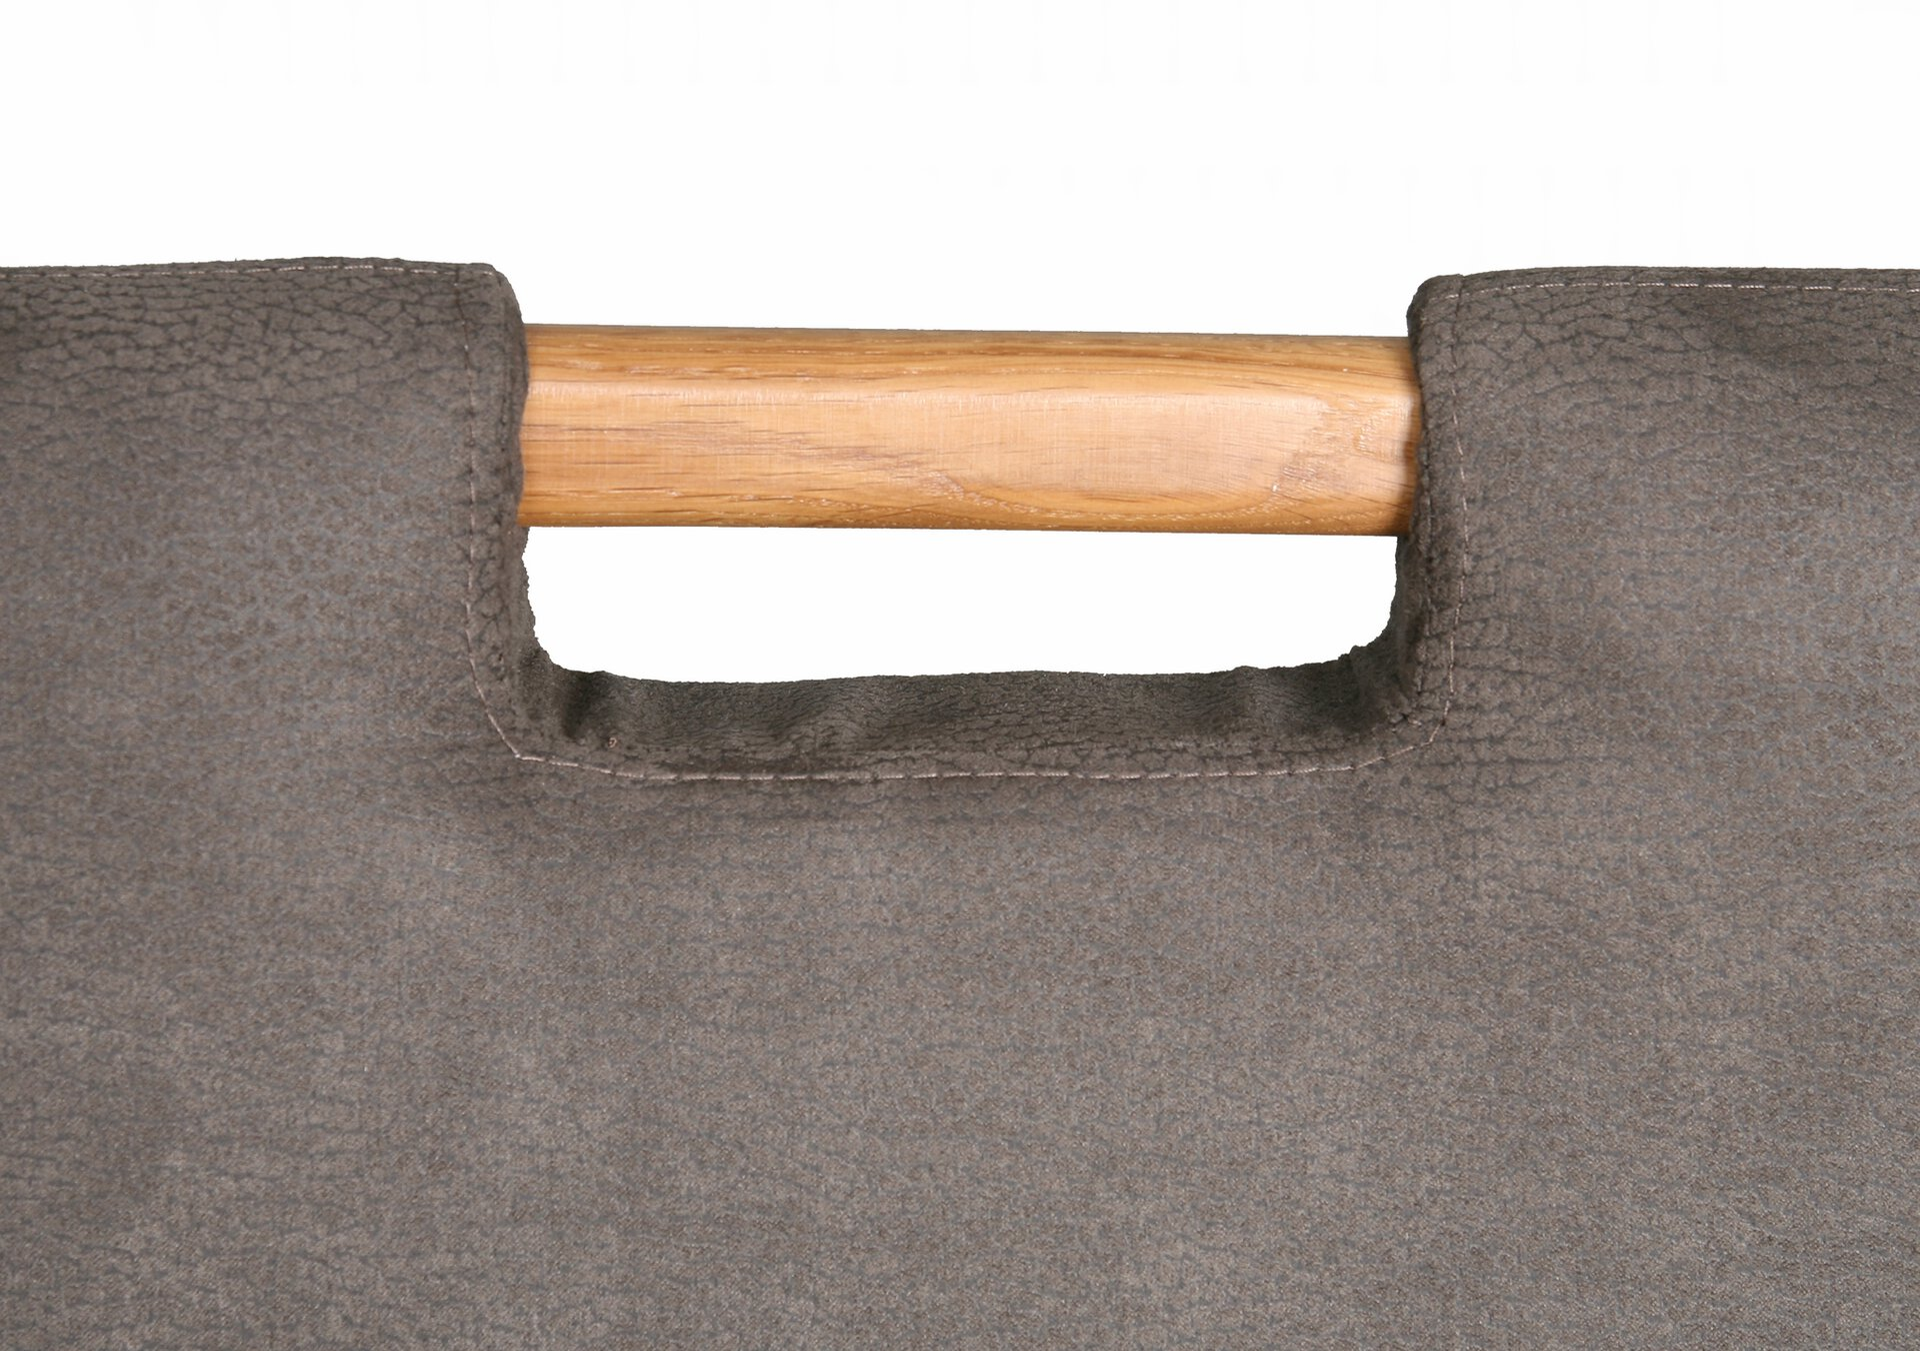 Stuhl SIANI Vito Textil mehrfarbig 64 x 100 x 47 cm